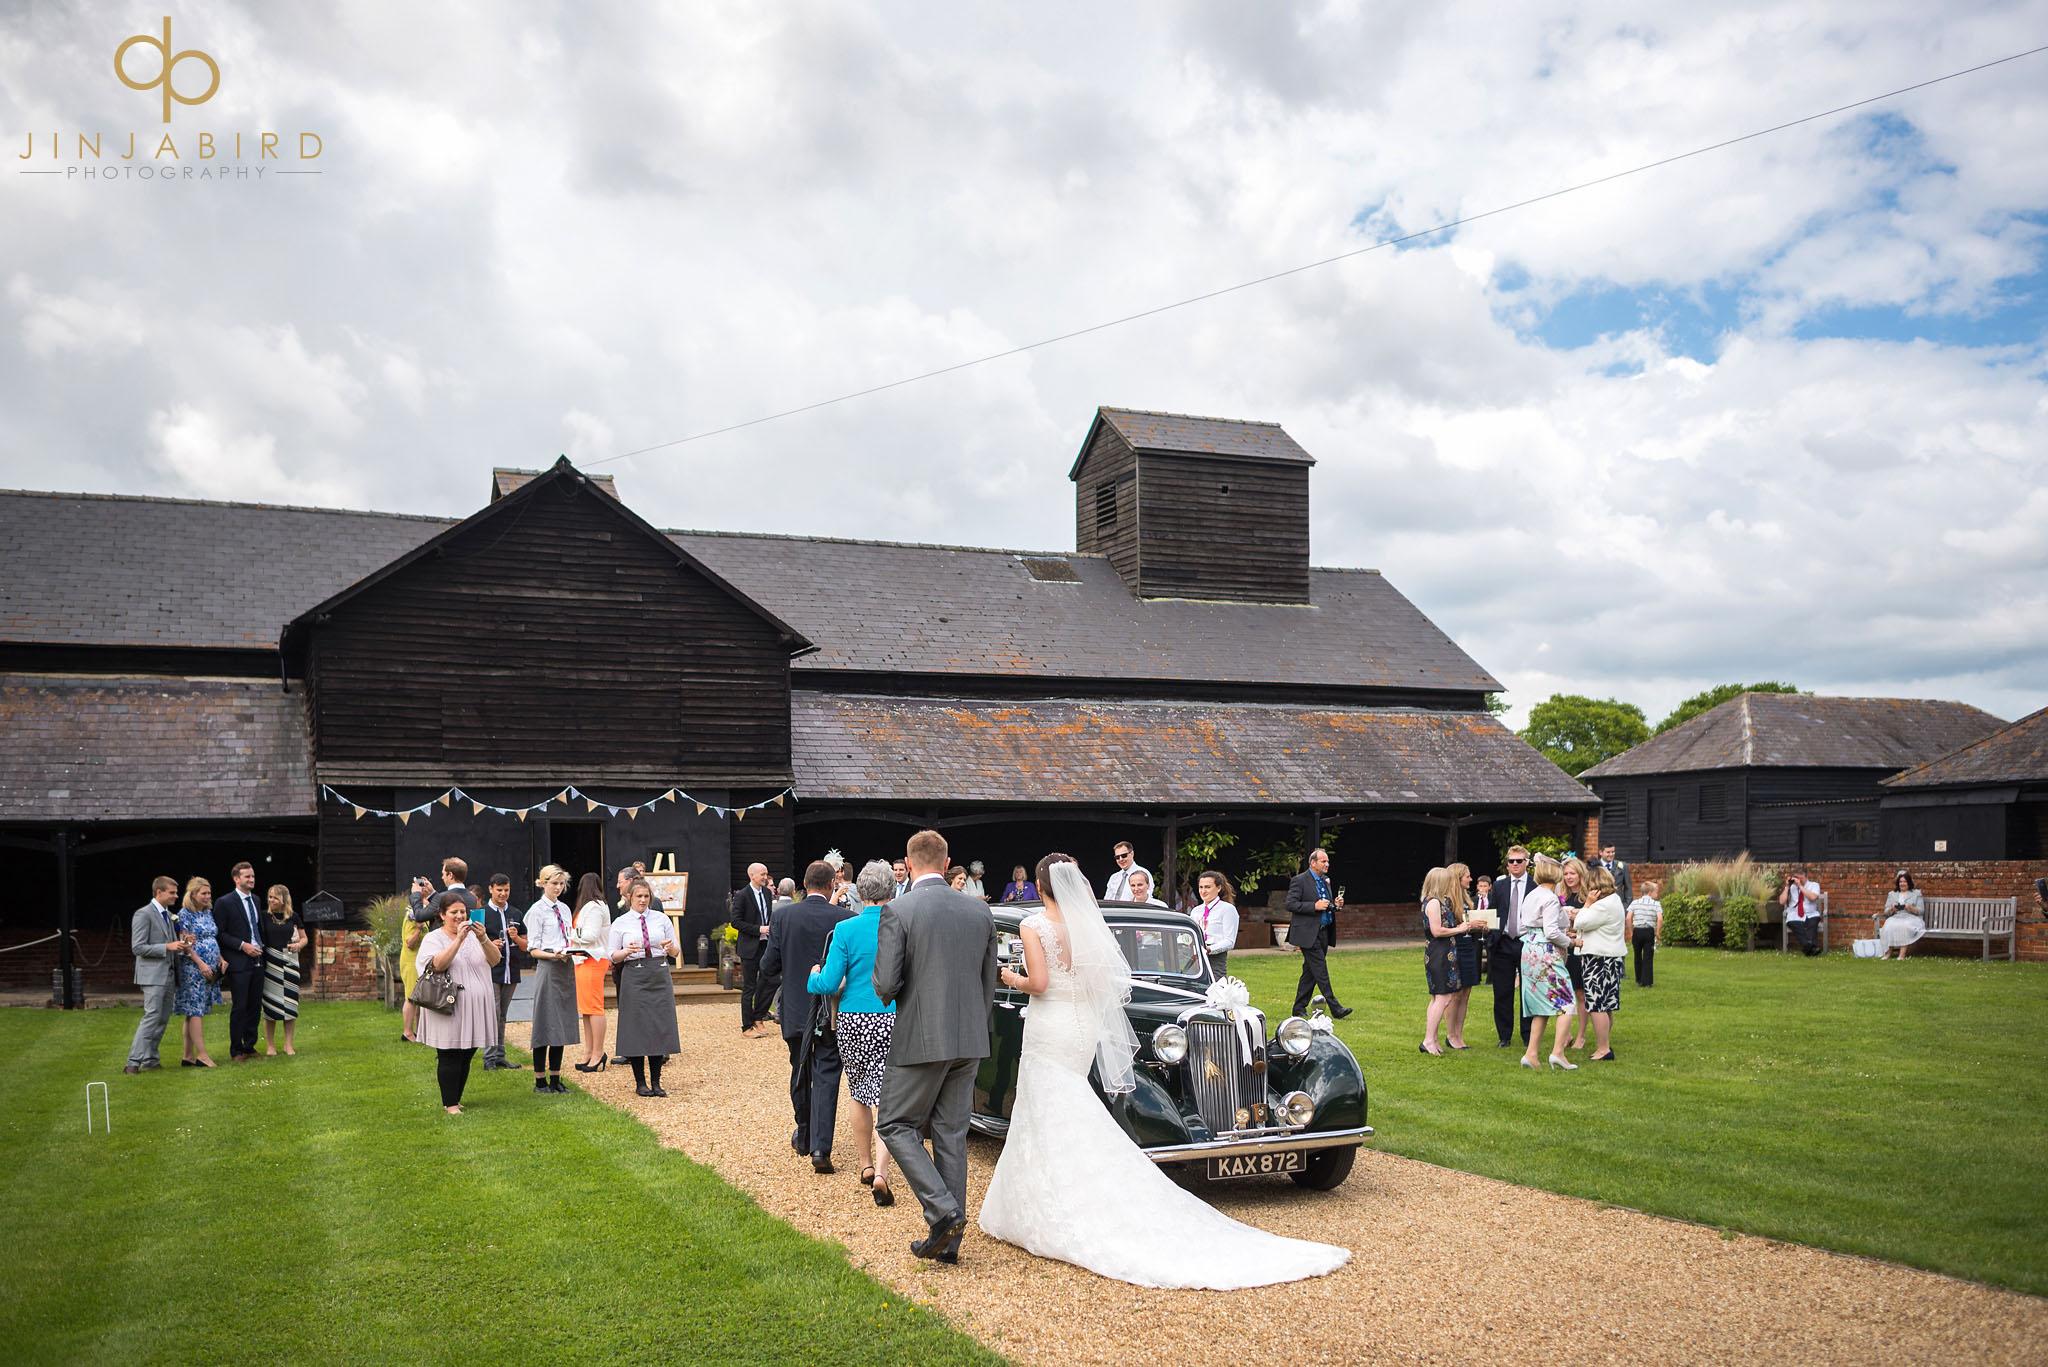 wedding childerley hall long barn